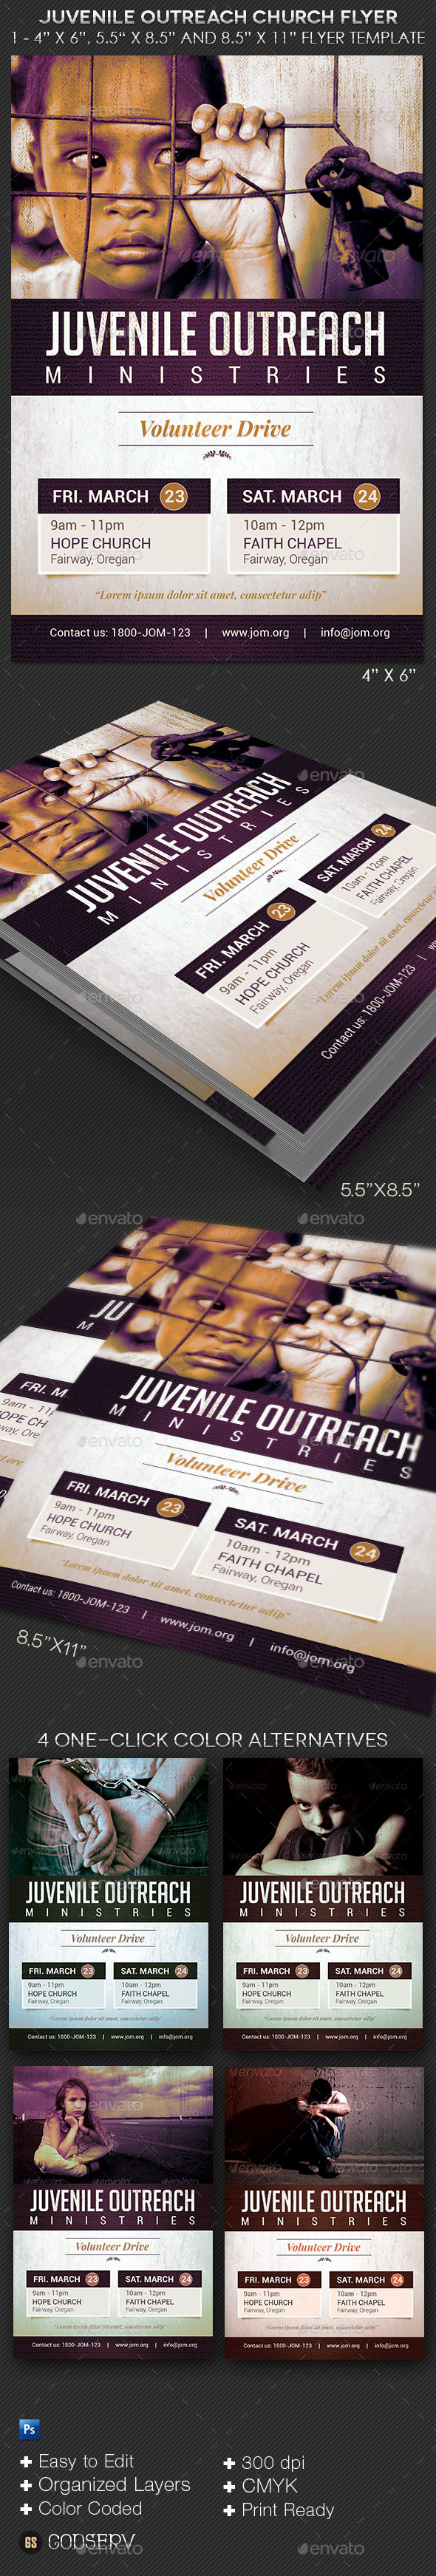 outreach ministry street flyers printable  u00bb dondrup com